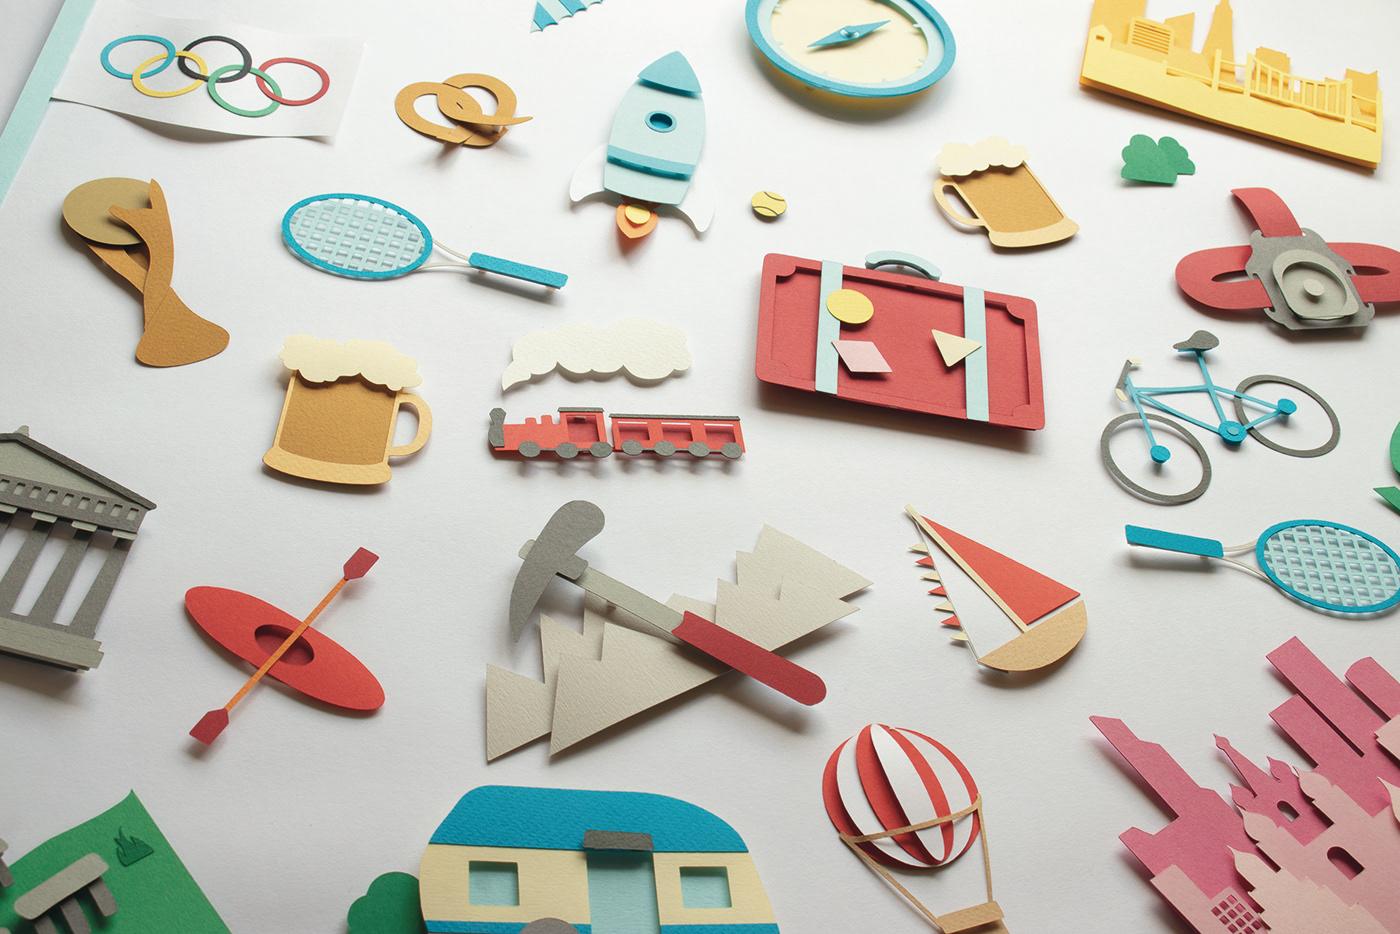 card game,Games,Travel,travel illustration,paper art,paper craft,paper